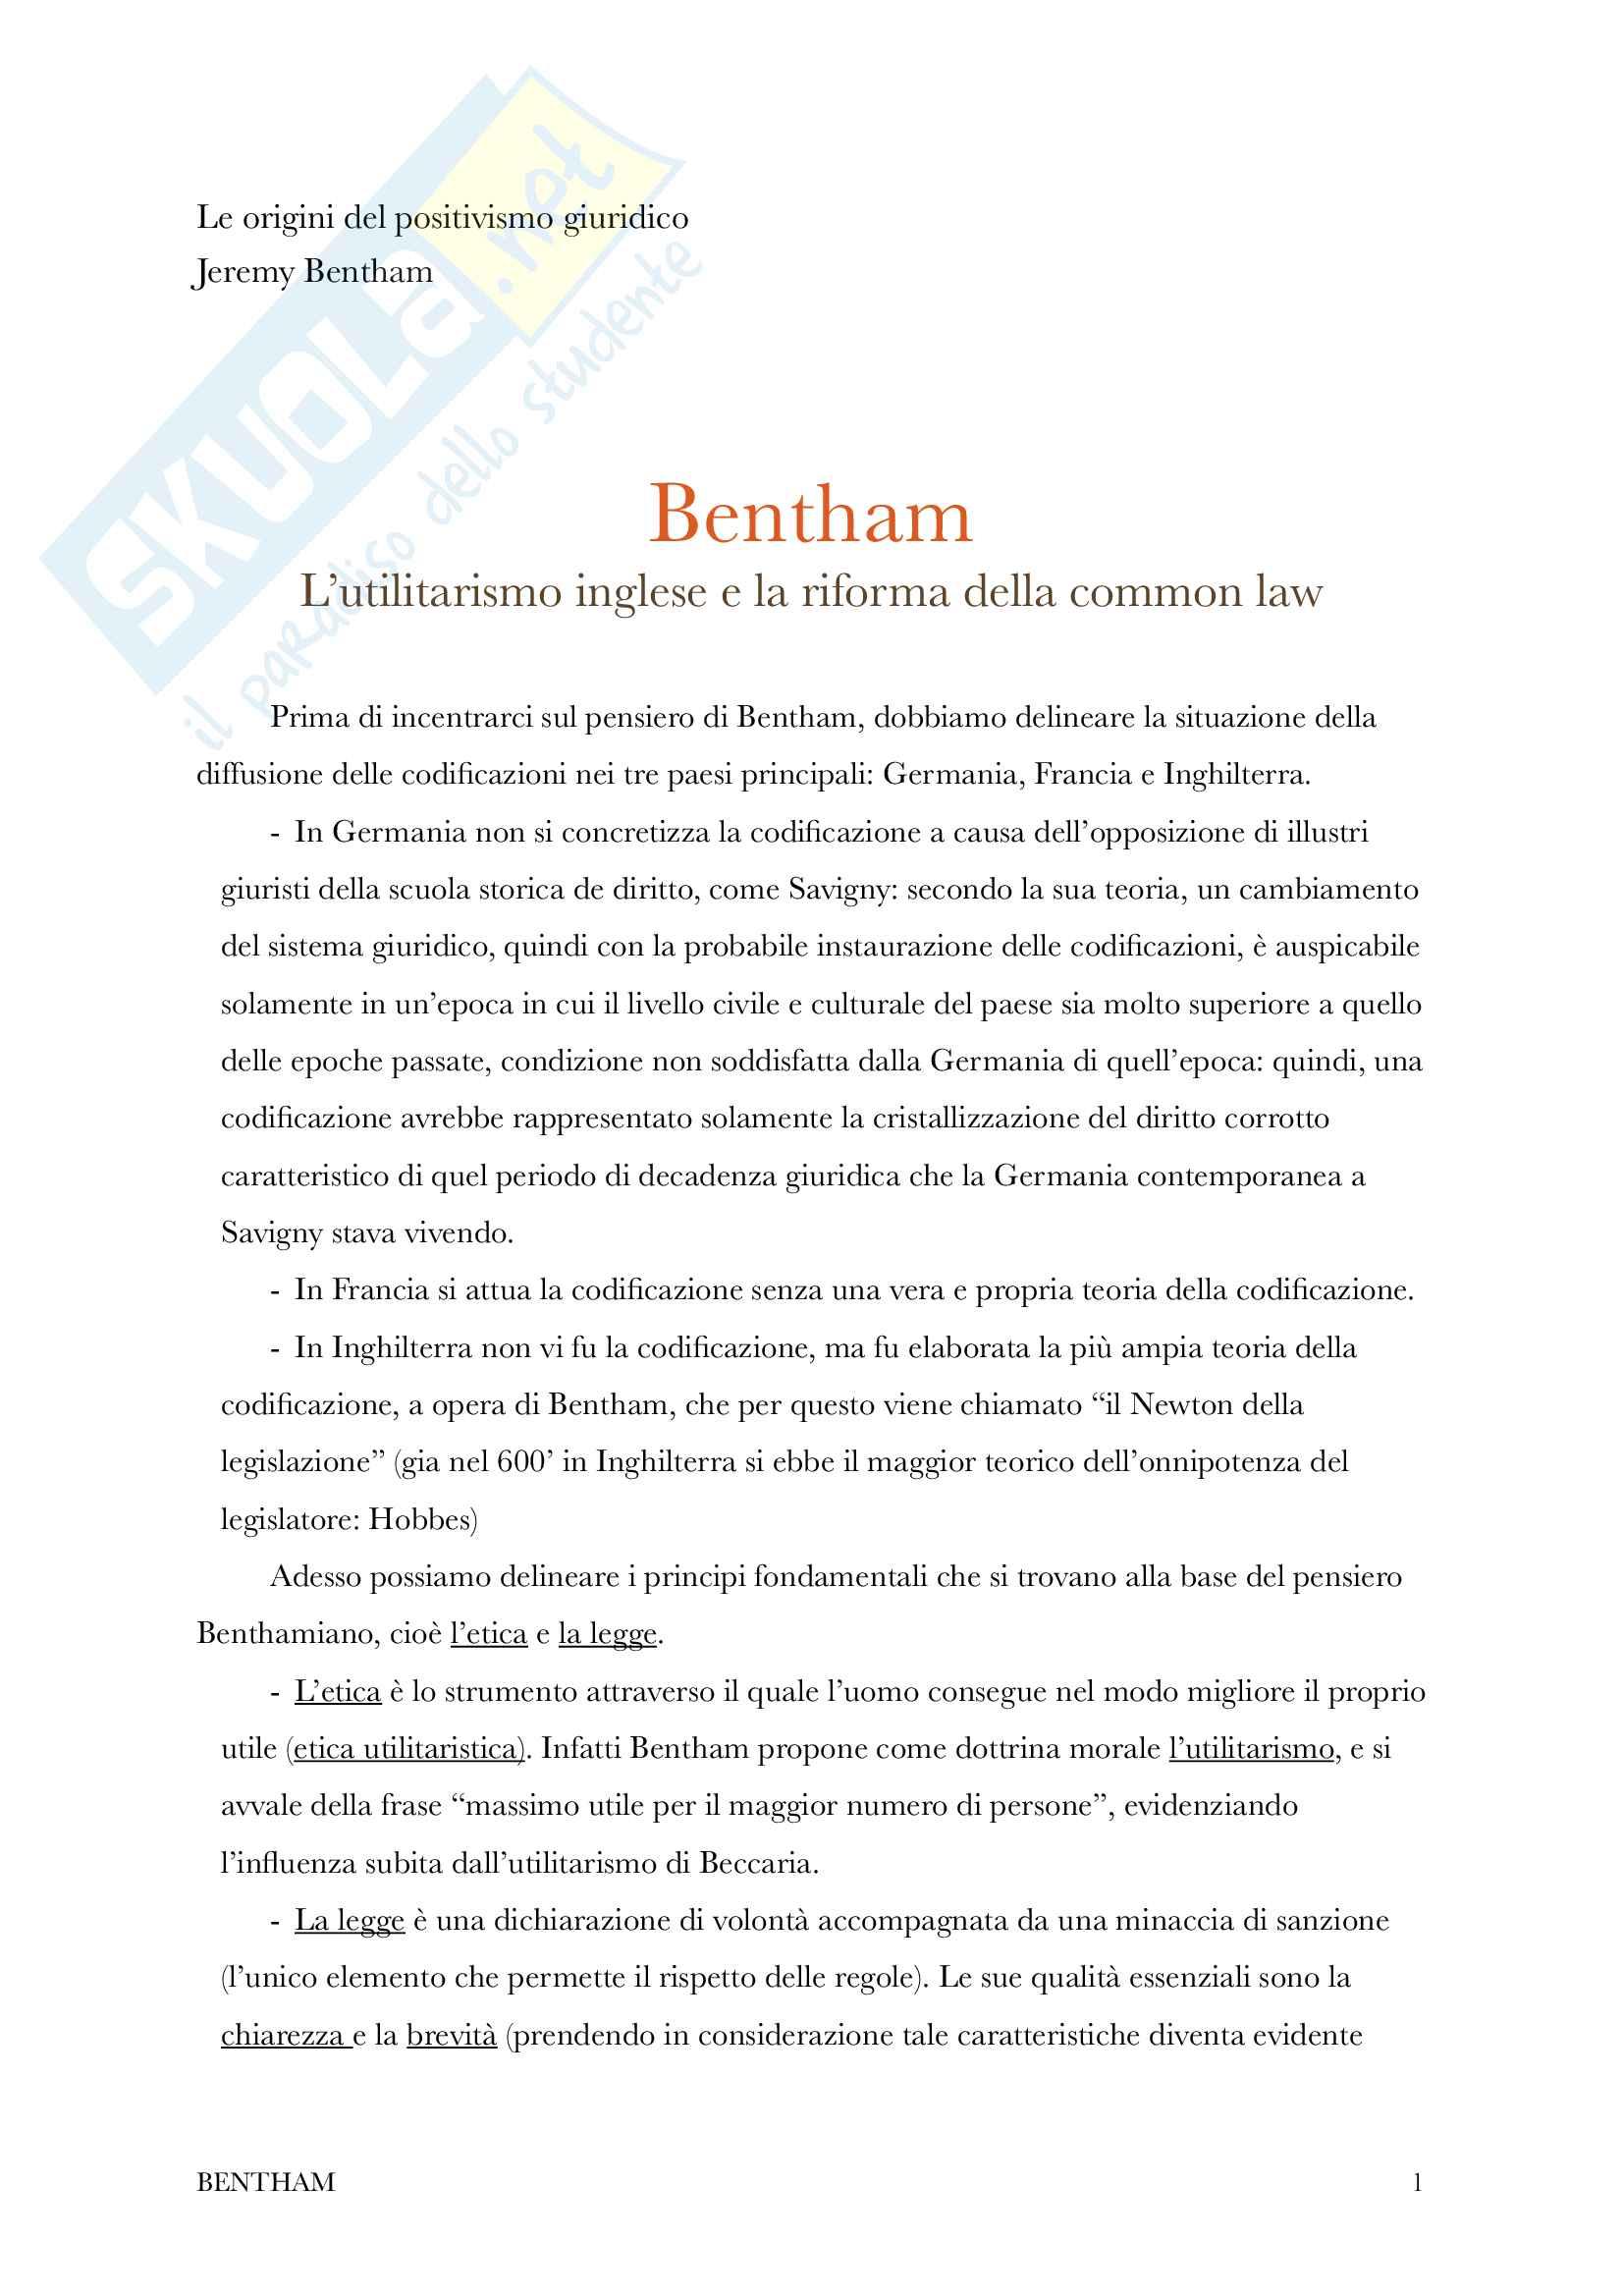 Bentham - Le origini del positivismo giuridico